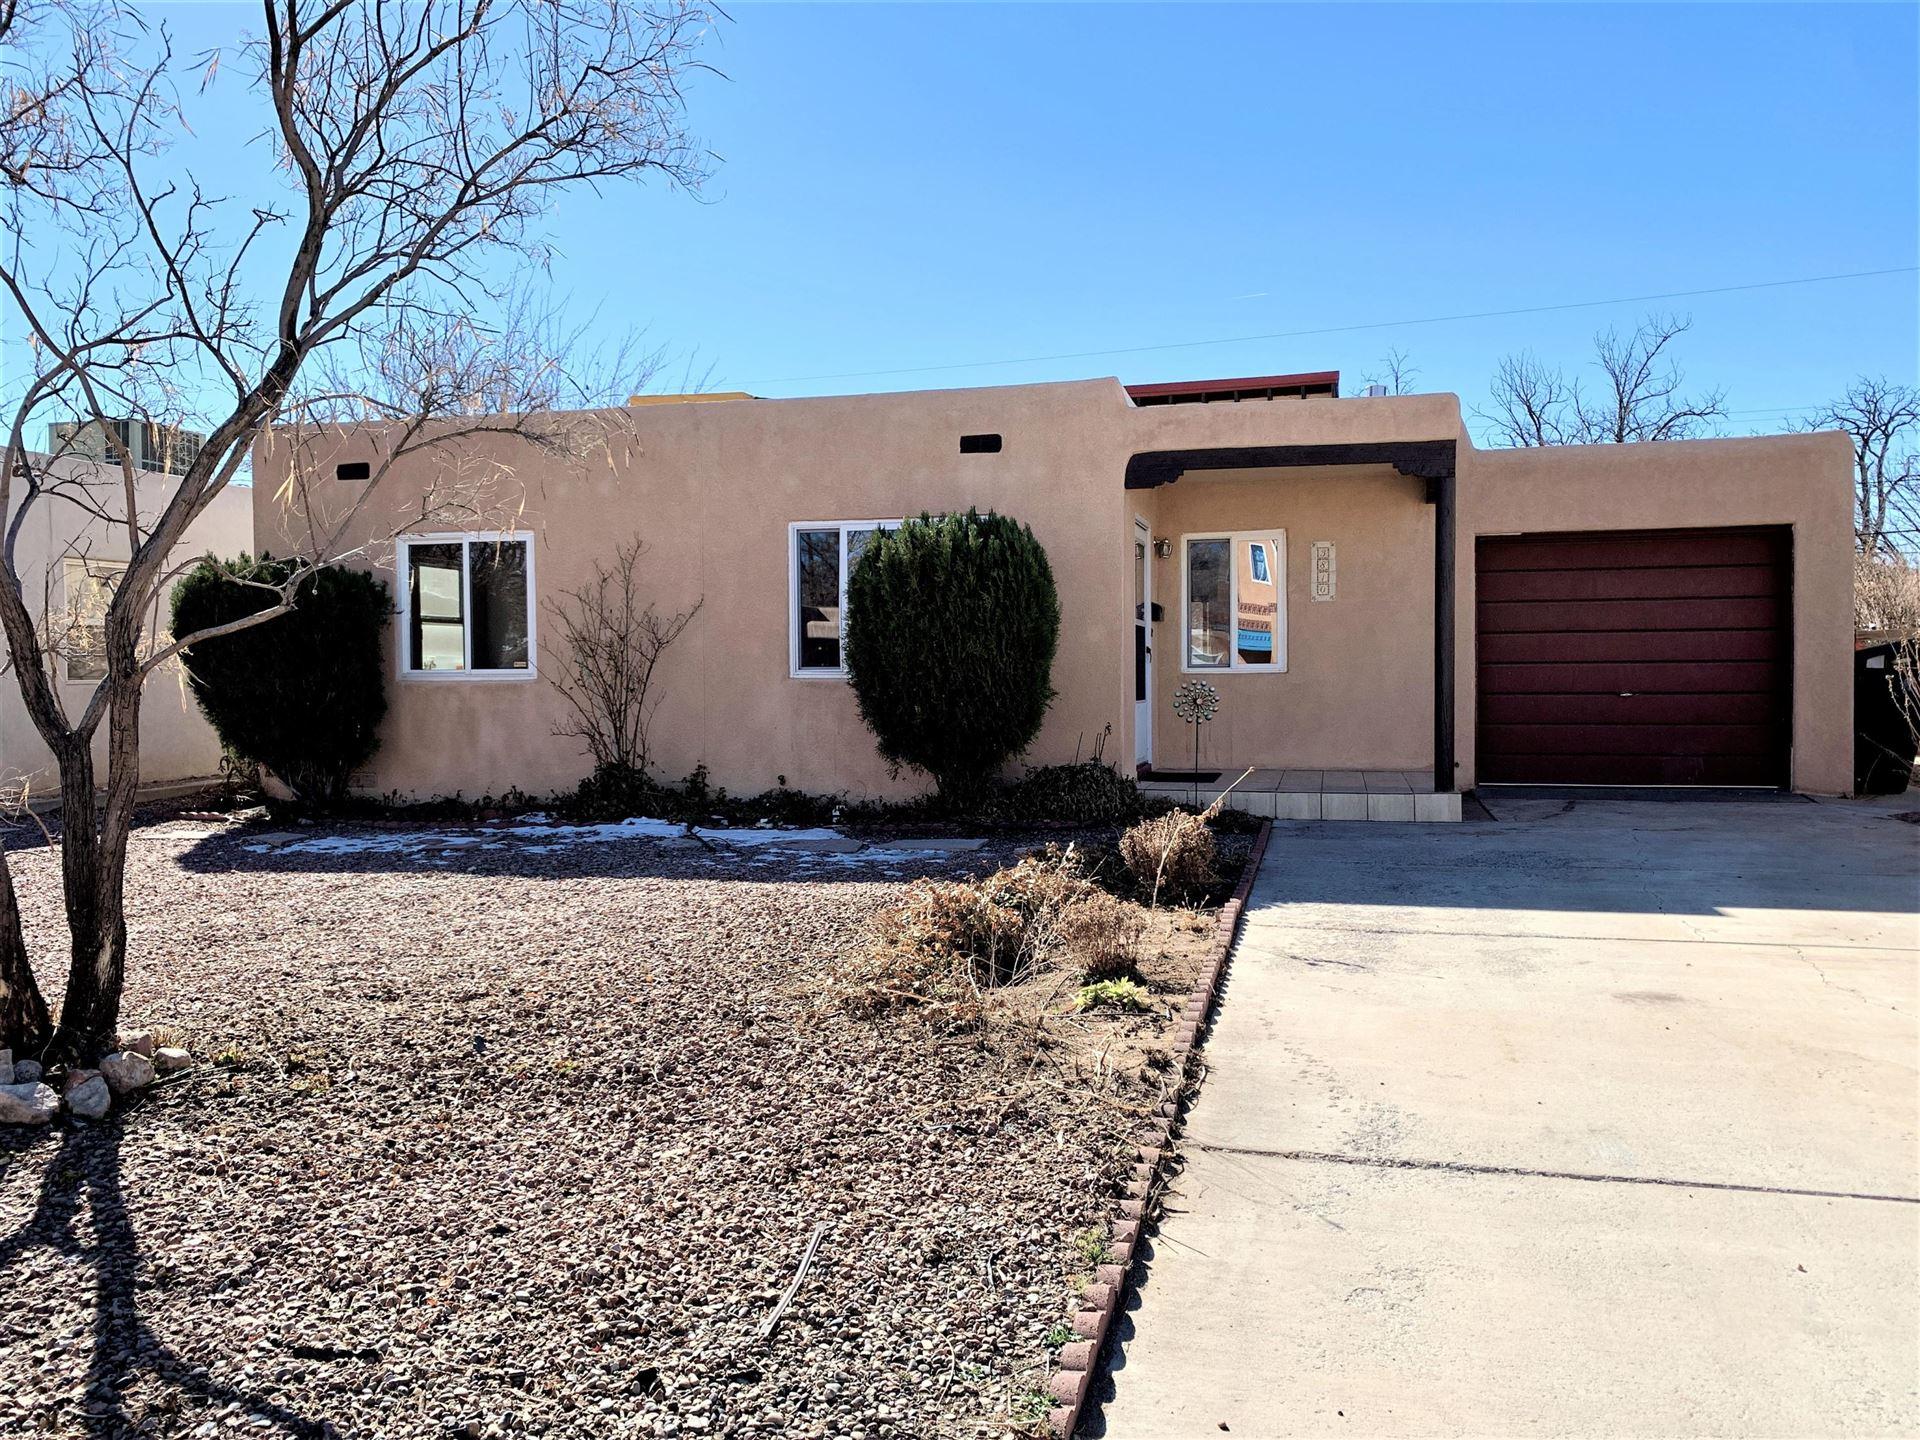 3810 ANDERSON Avenue SE, Albuquerque, NM 87108 - MLS#: 986541